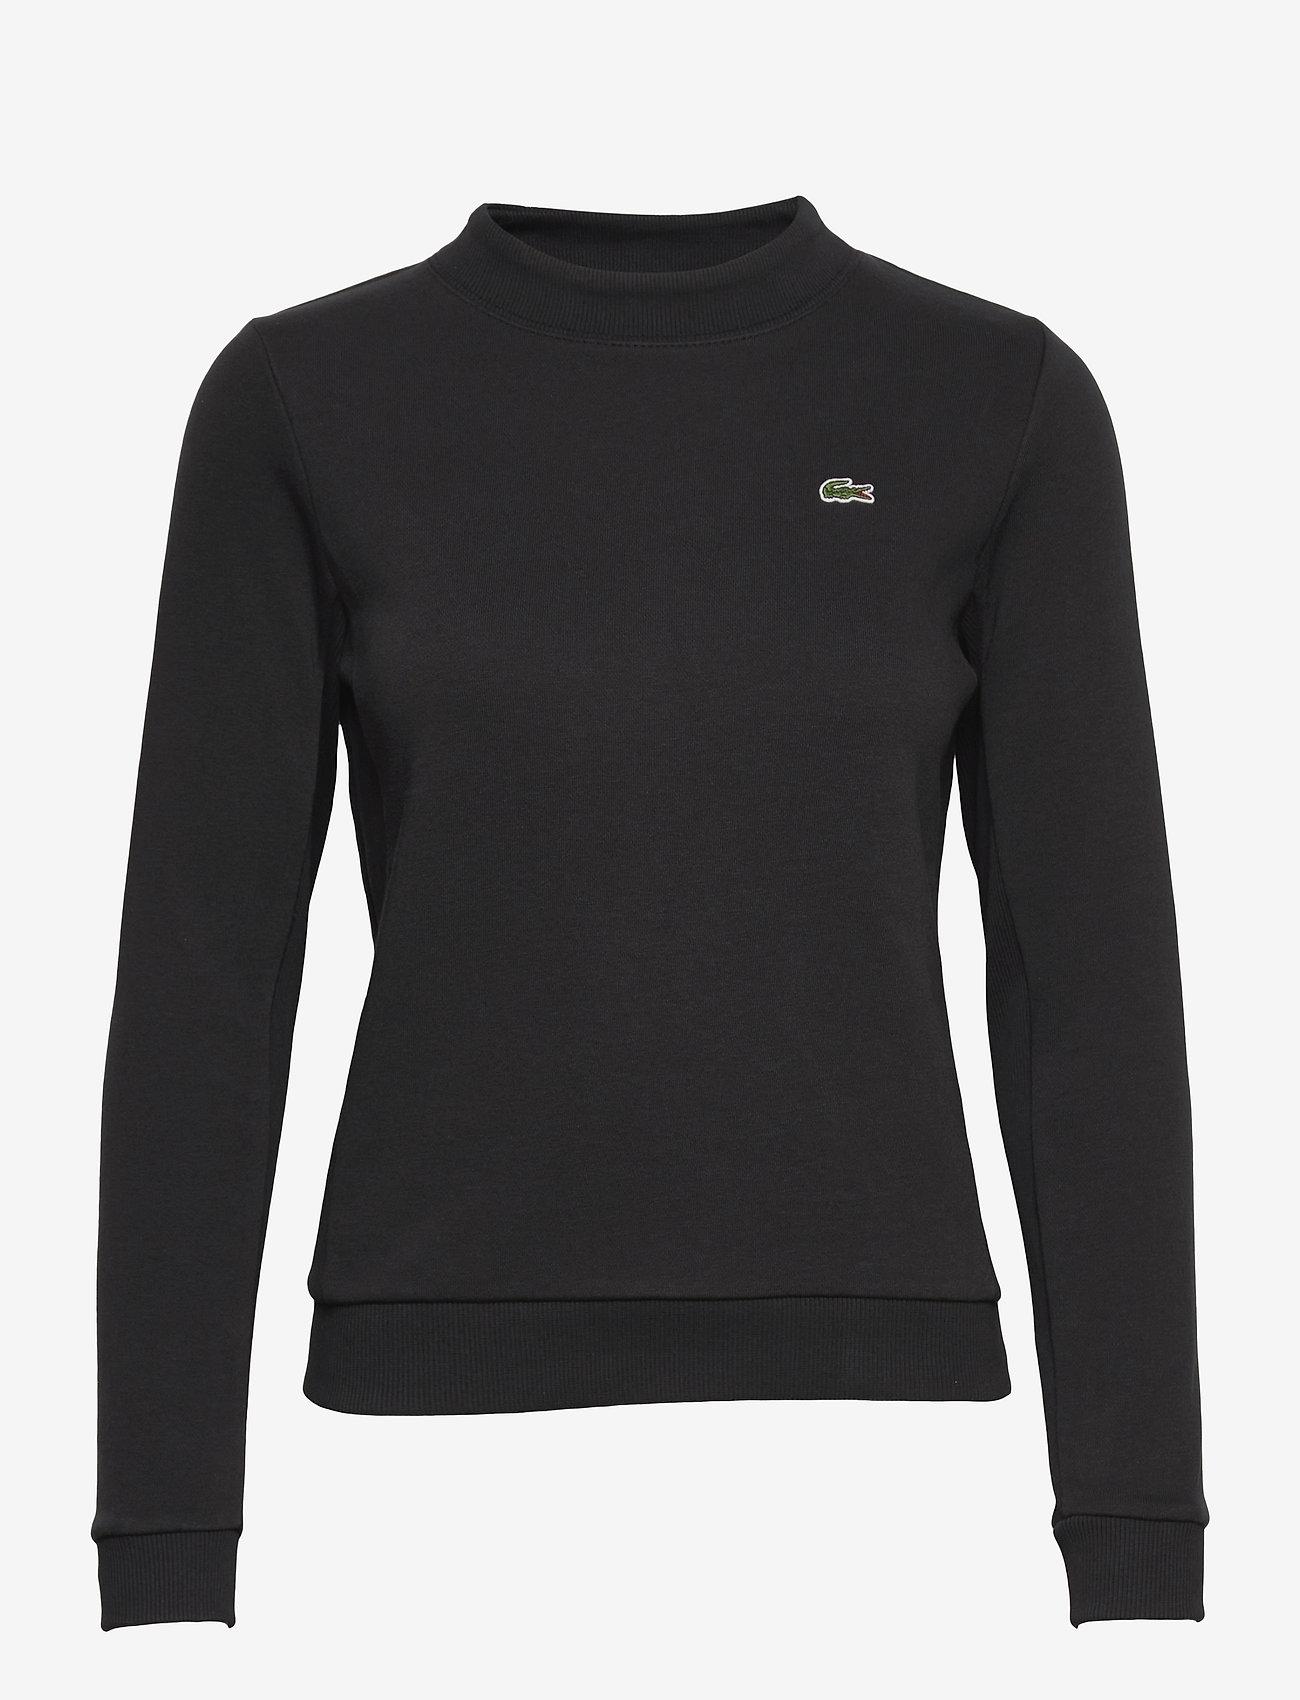 Lacoste - Women s sweatshirt - sweatshirts - black - 0